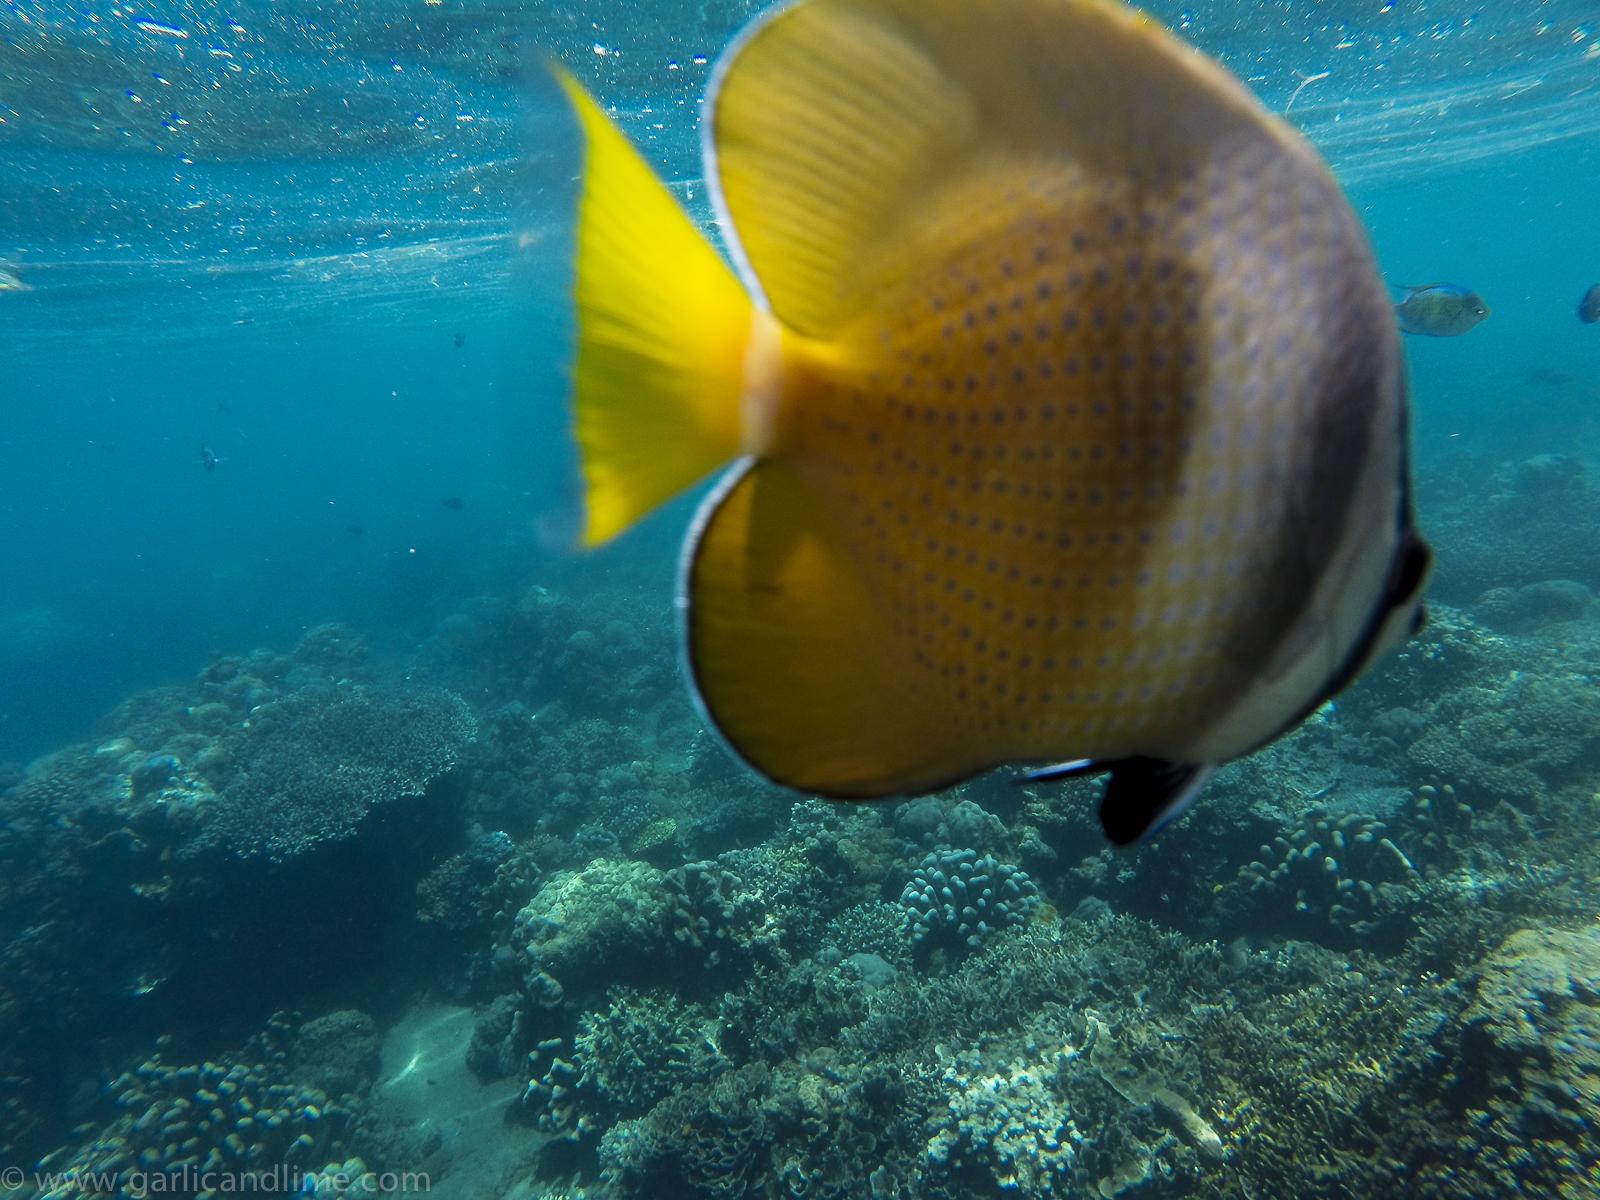 Snorkeling Pulau Bunaken Sulawesi Indonesia